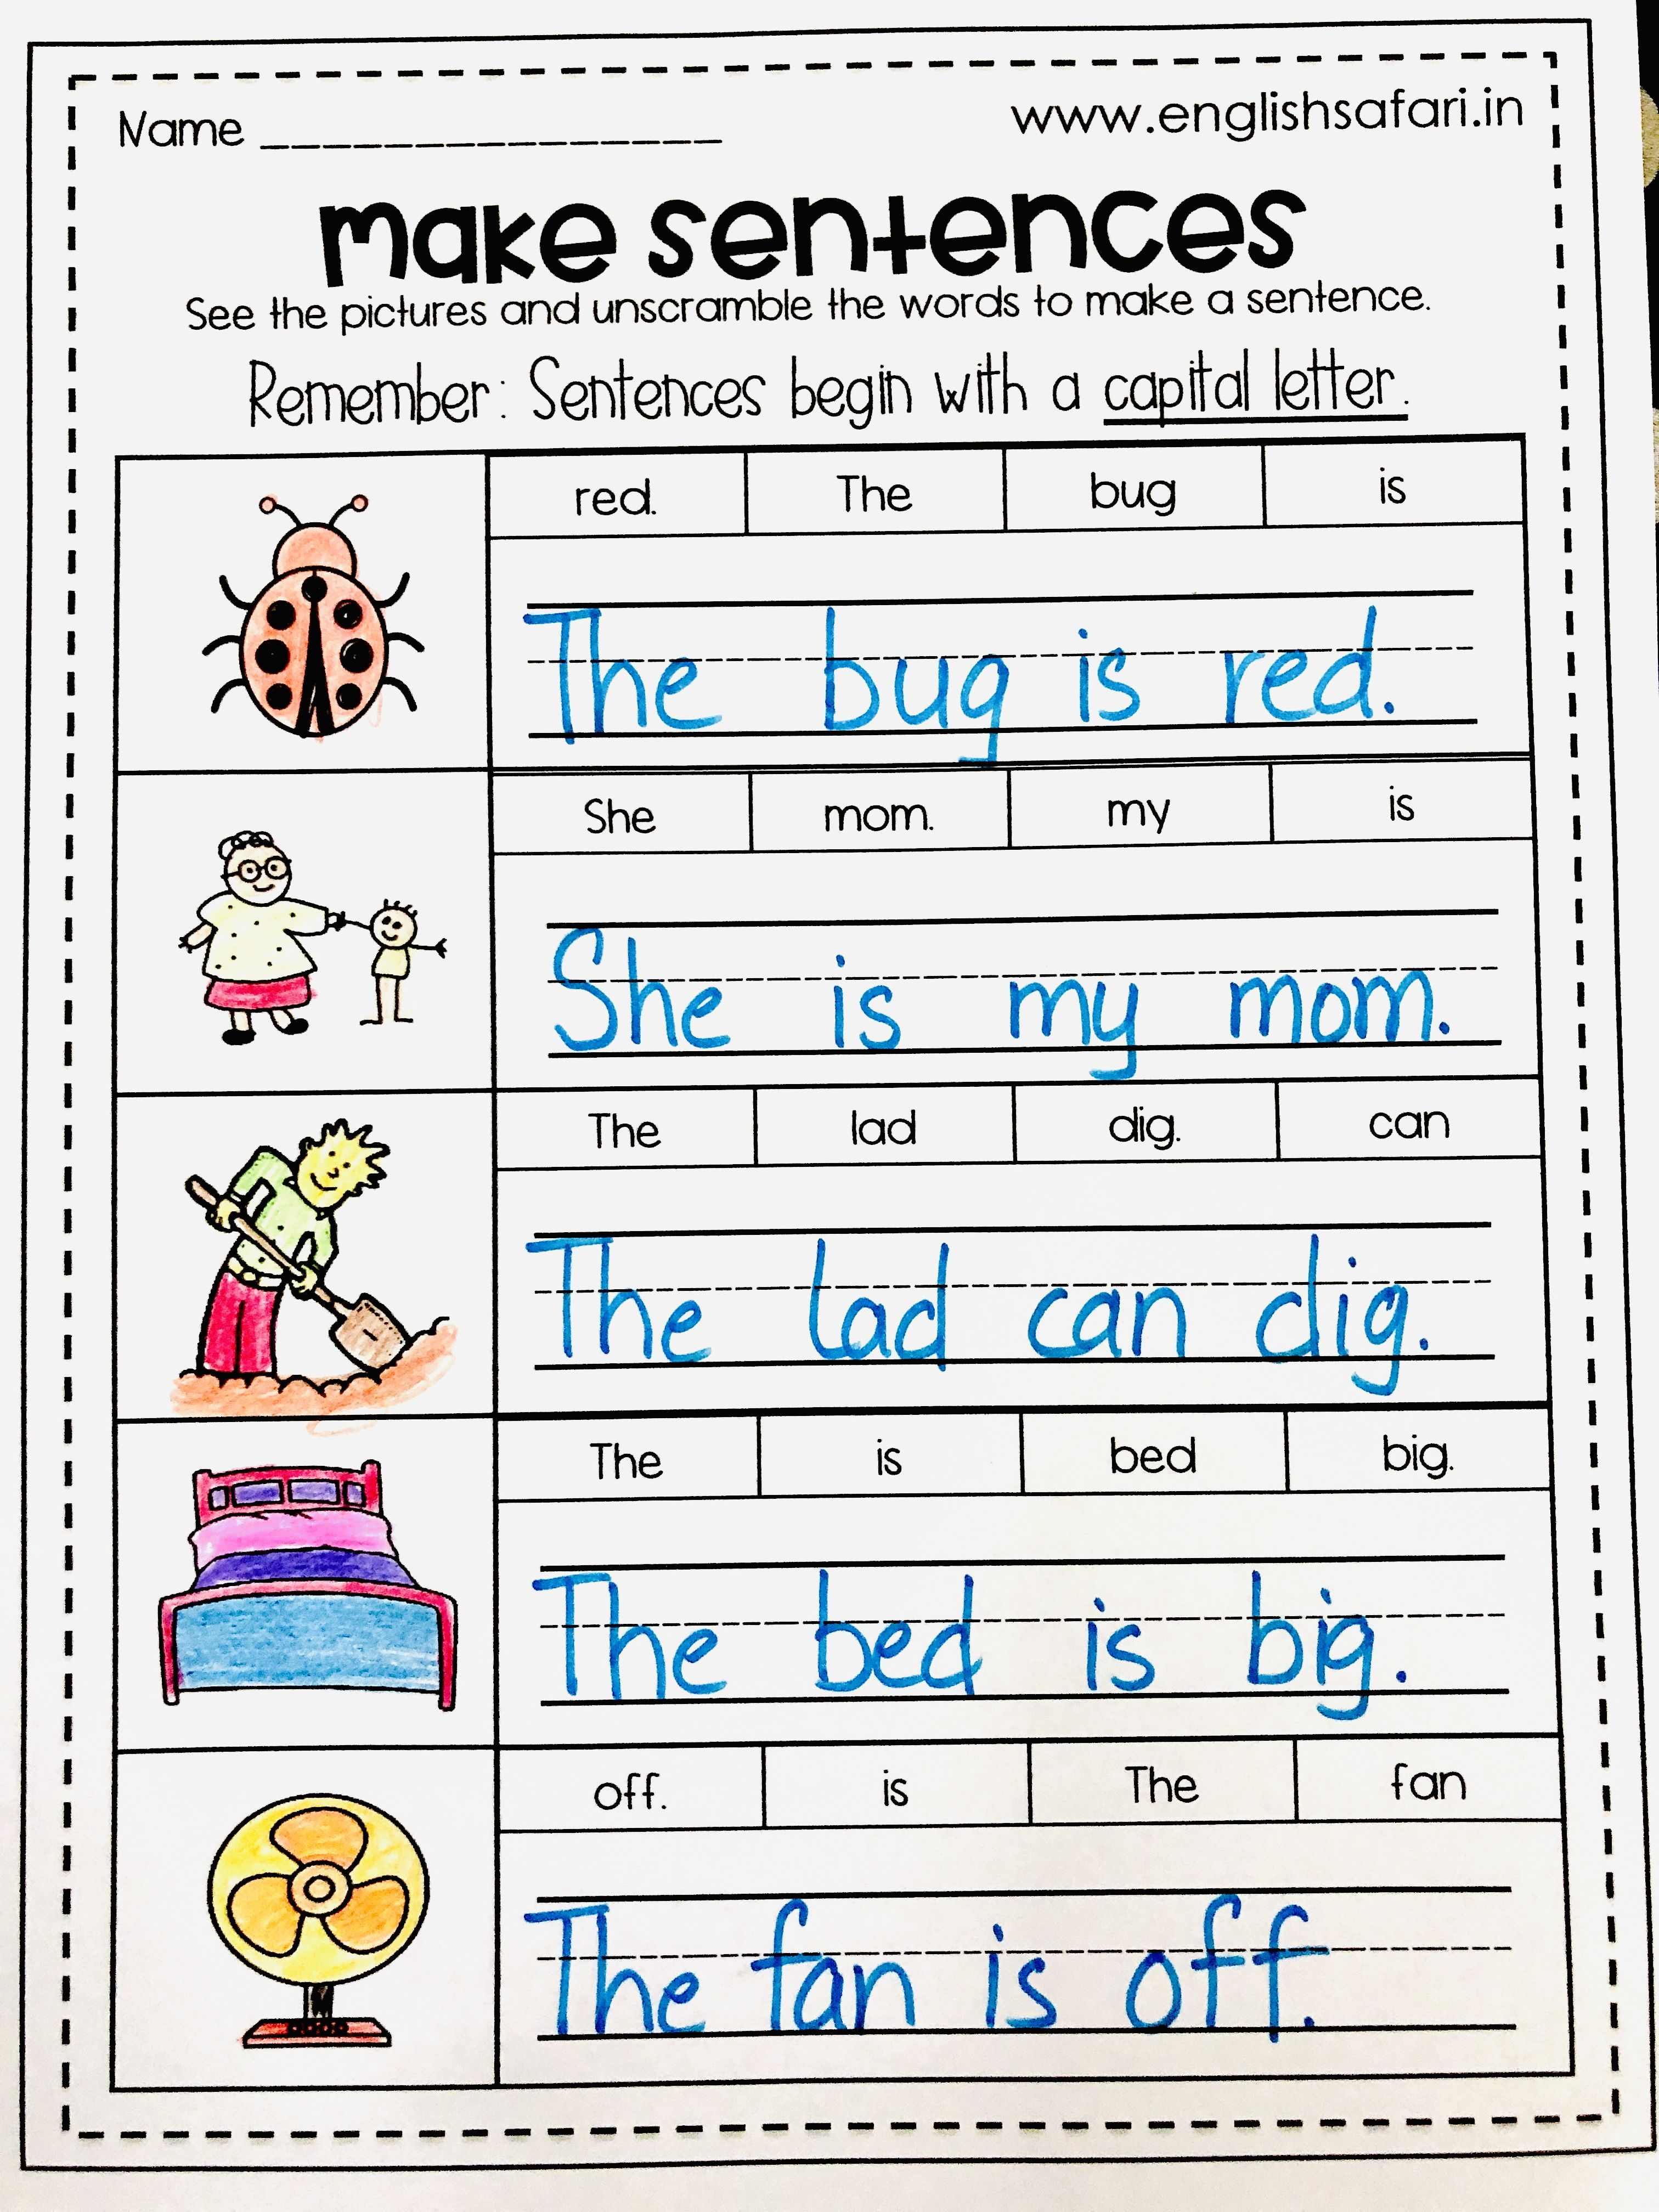 Make Sentences Kindergarten Free Www Englishsafari In Sentences Kindergarten Writing Sentences Kindergarten Make Sentences Kindergarten sentence writing worksheets